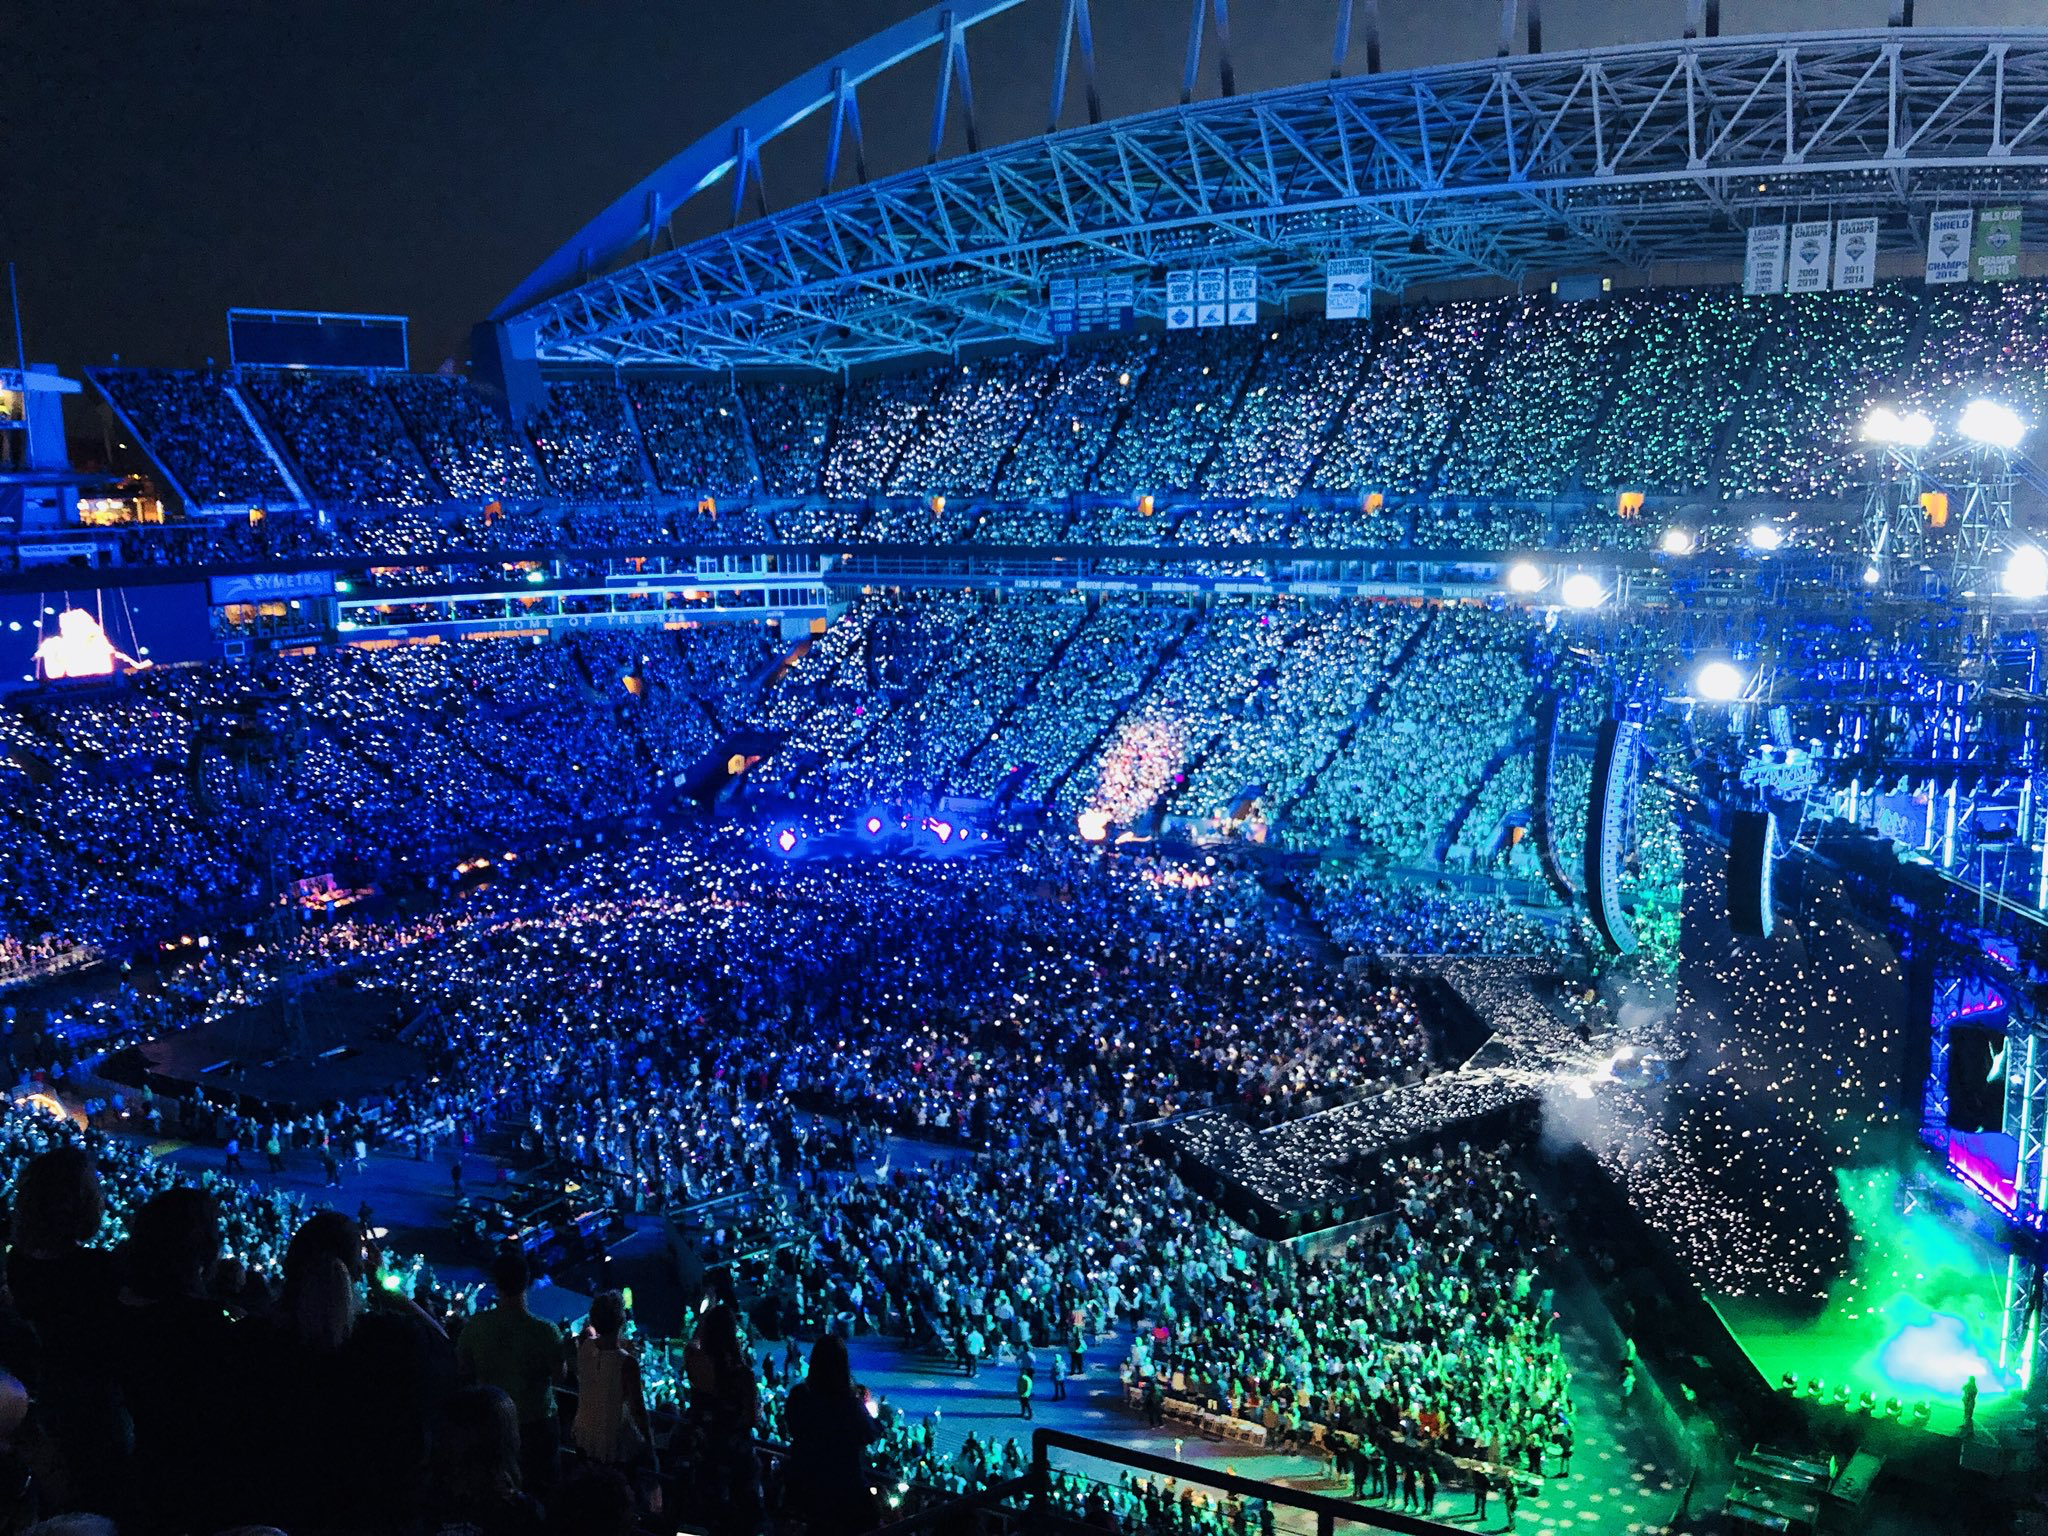 Seattle Reputation Stadium Tour 2018 Taylorswift 5 22 2018 Taylor Swift Pictures Concert Crowd Stadium Tour